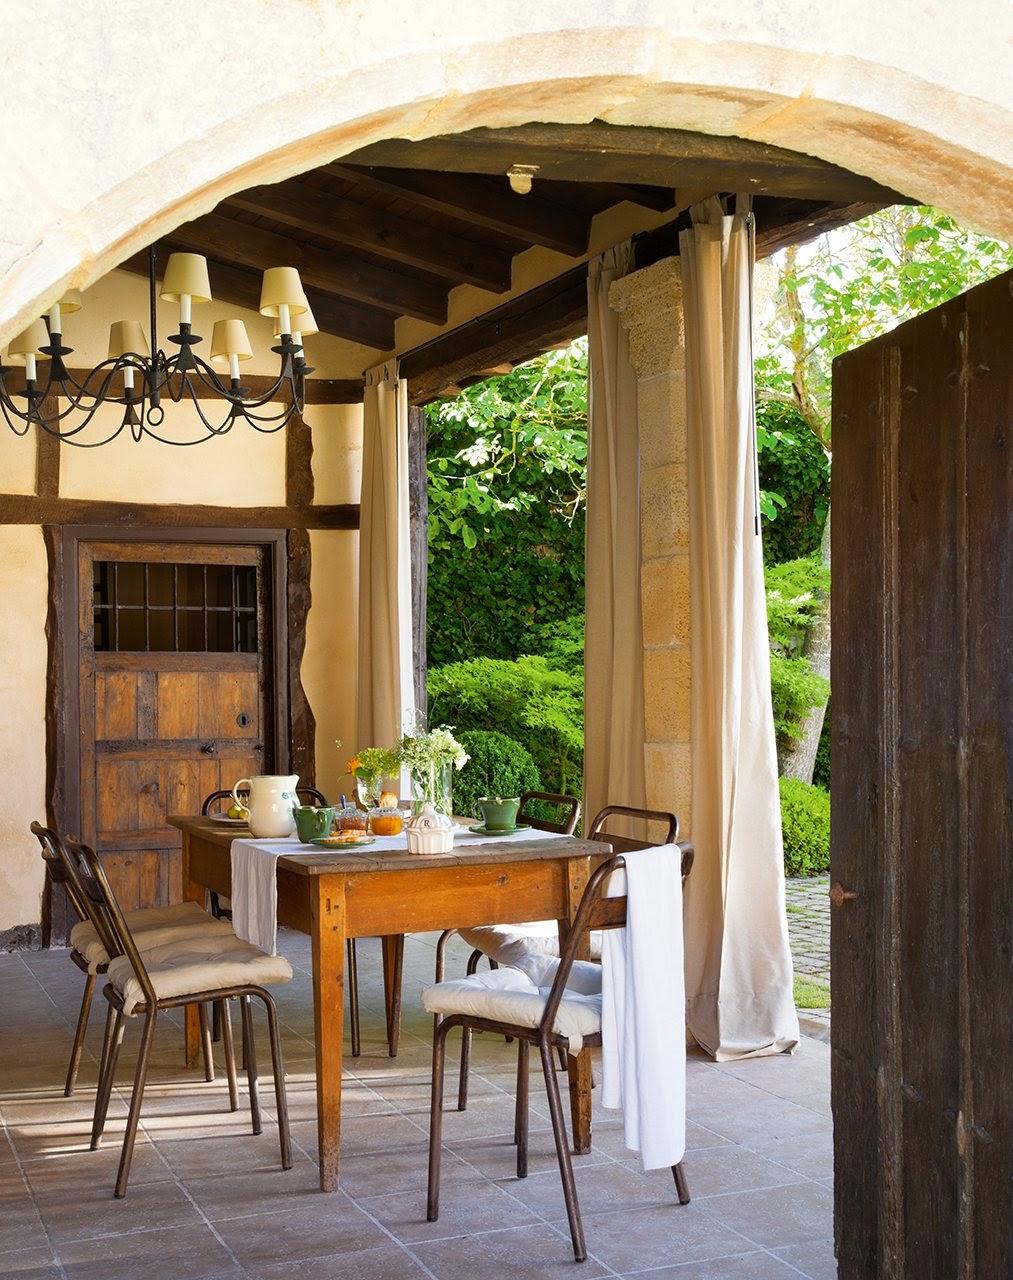 amenajari, interioare, decoratiuni, decor, design interior, stil rustic, reconversie, zid de piatra, exterior, gradina, terasa,